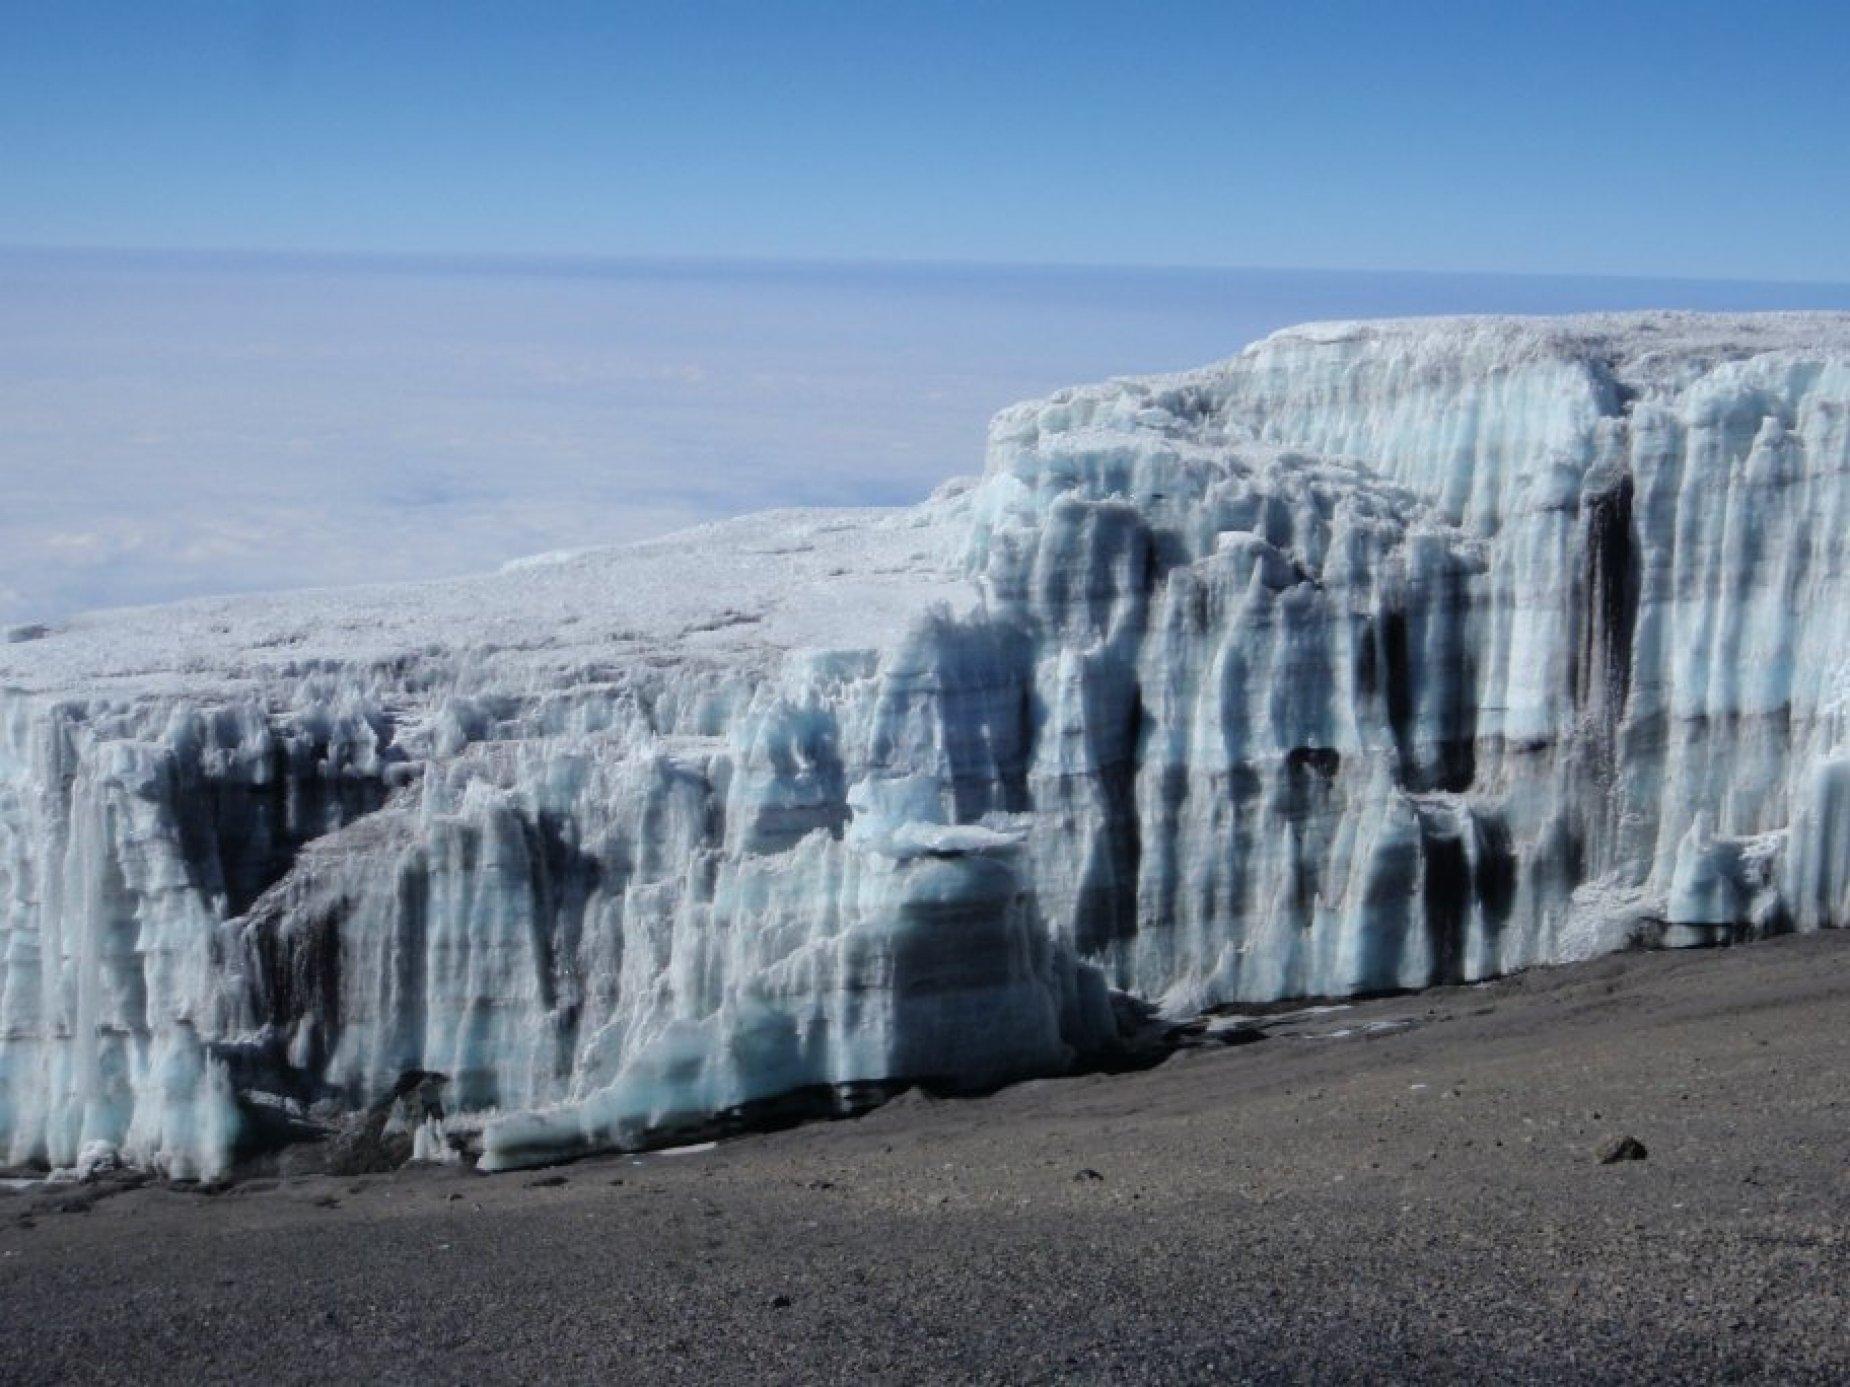 Receeding Glaciers on top of Kili